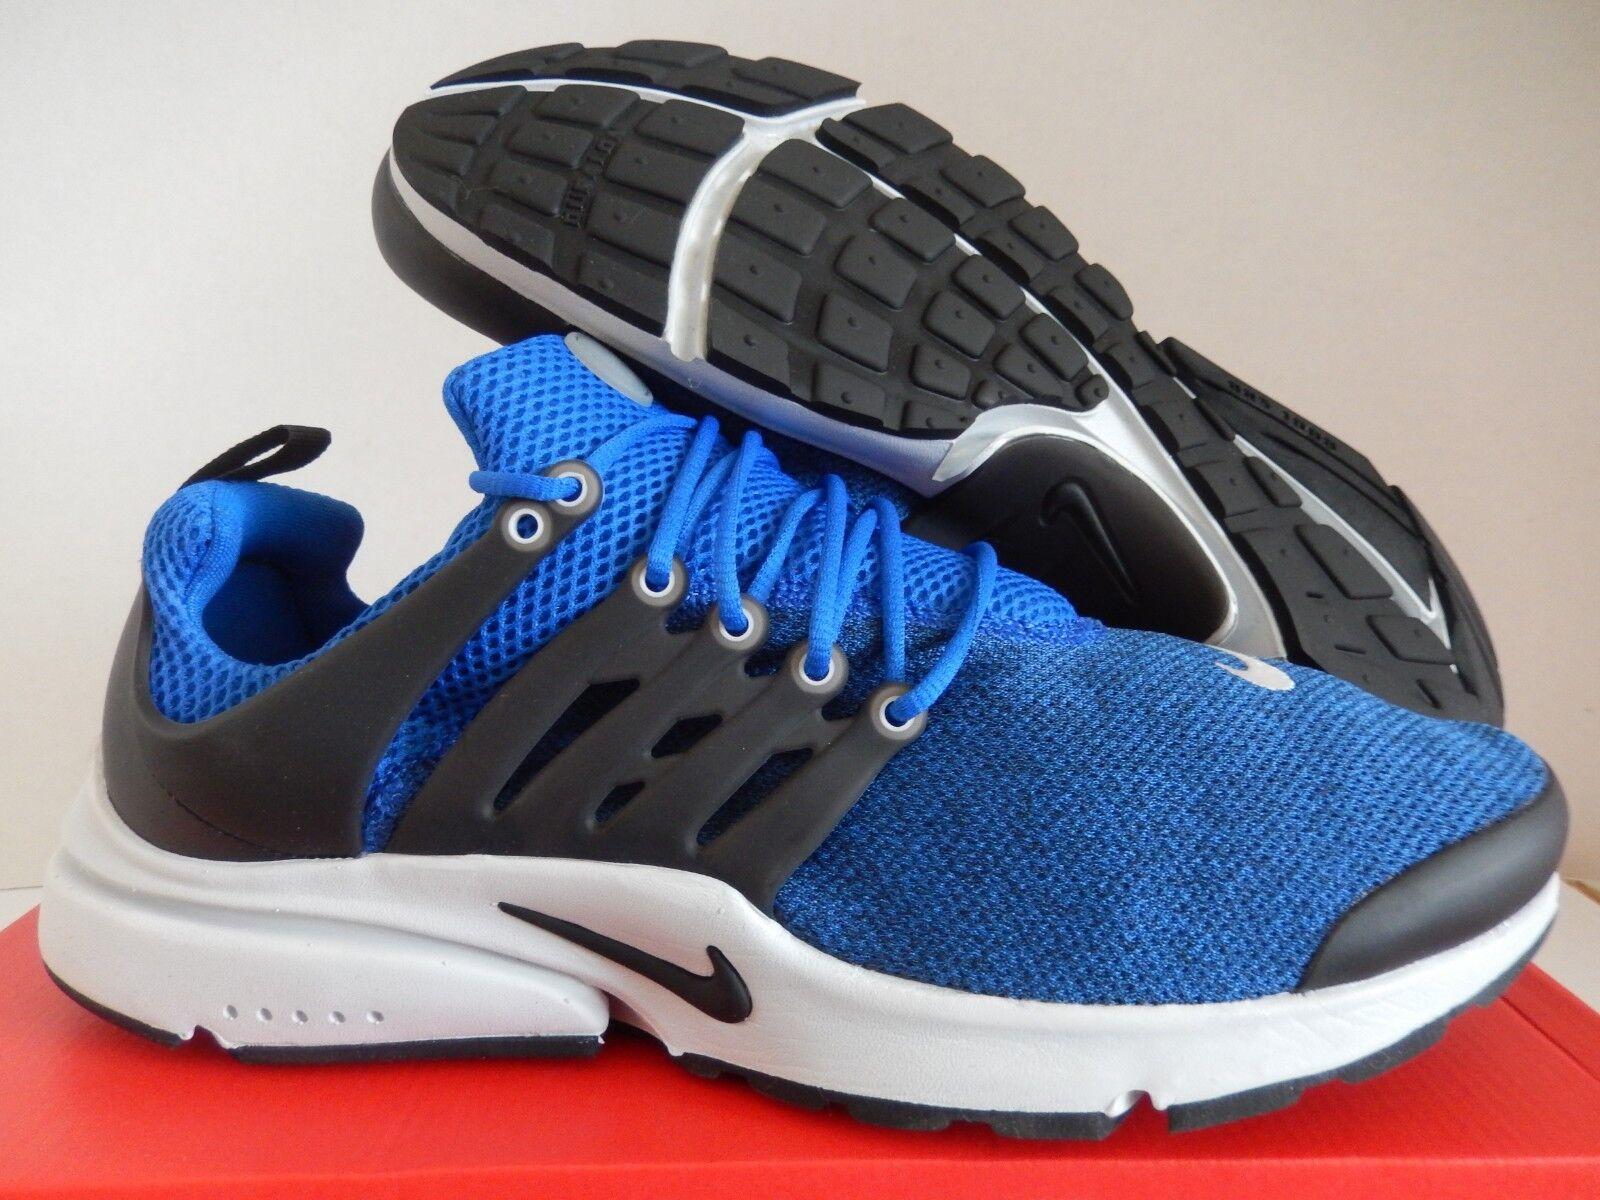 Nike air presto partita fondamentale partita presto royal blue-nero-nero sz 13 [848187-403] b1bf60